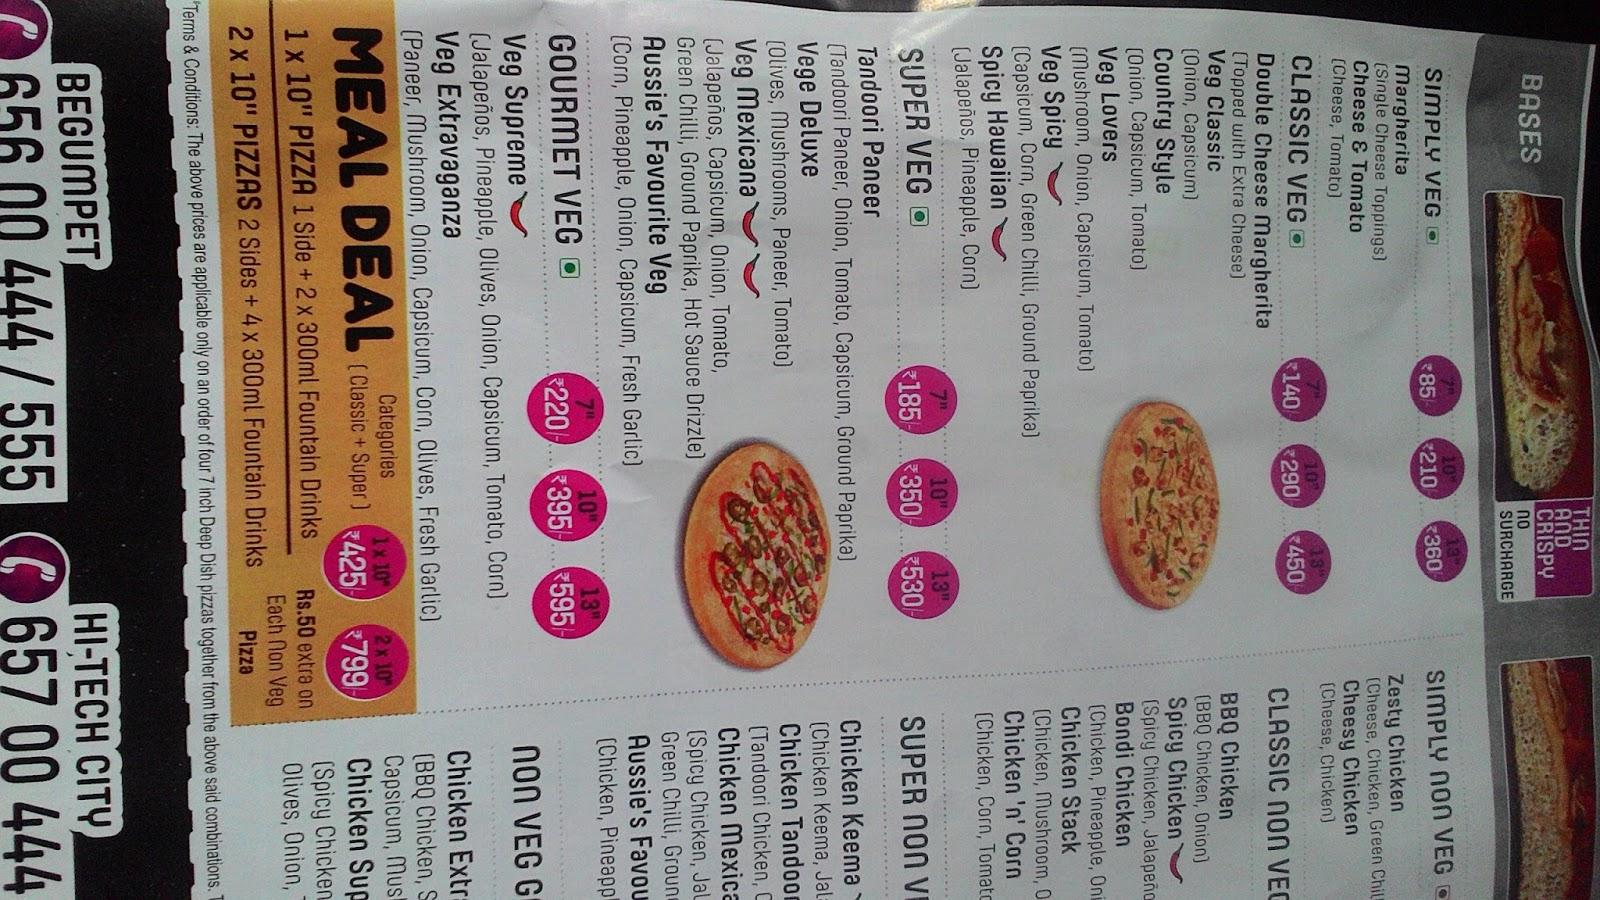 eagle boys pizza report 2 essay